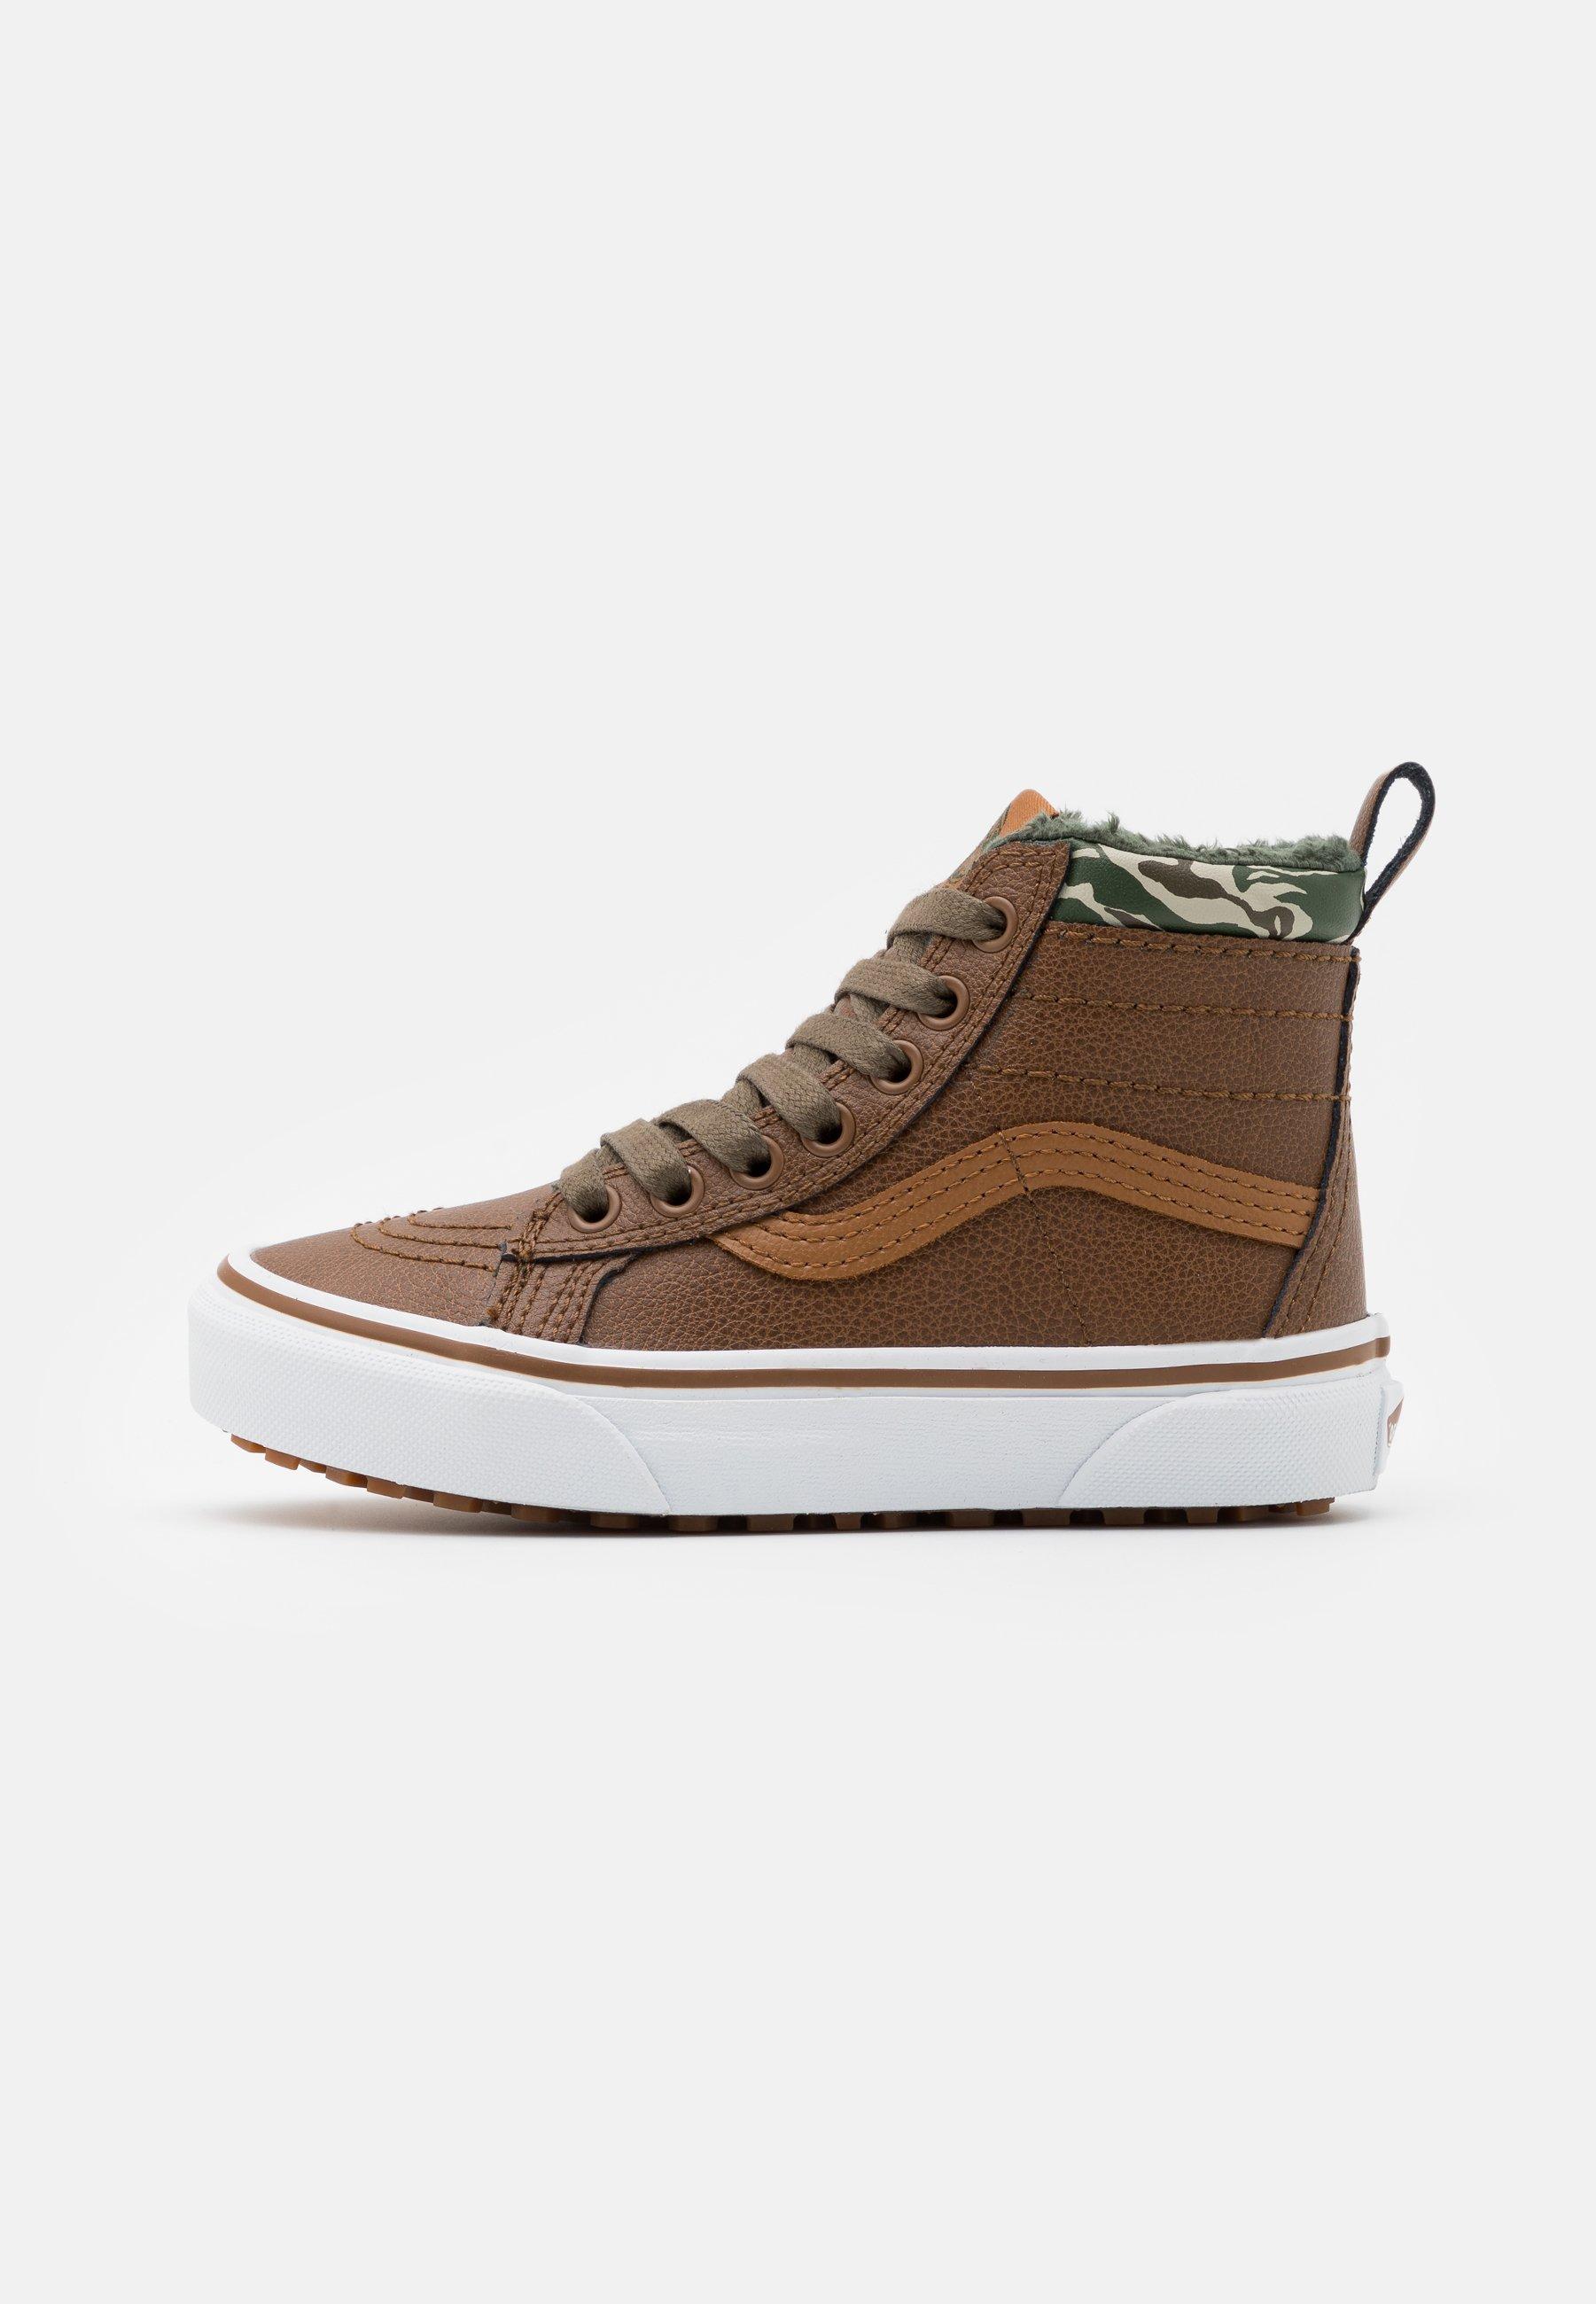 Vans SK8 MTE UNISEX - Sneakers alte - camel/sabbia - Zalando.it